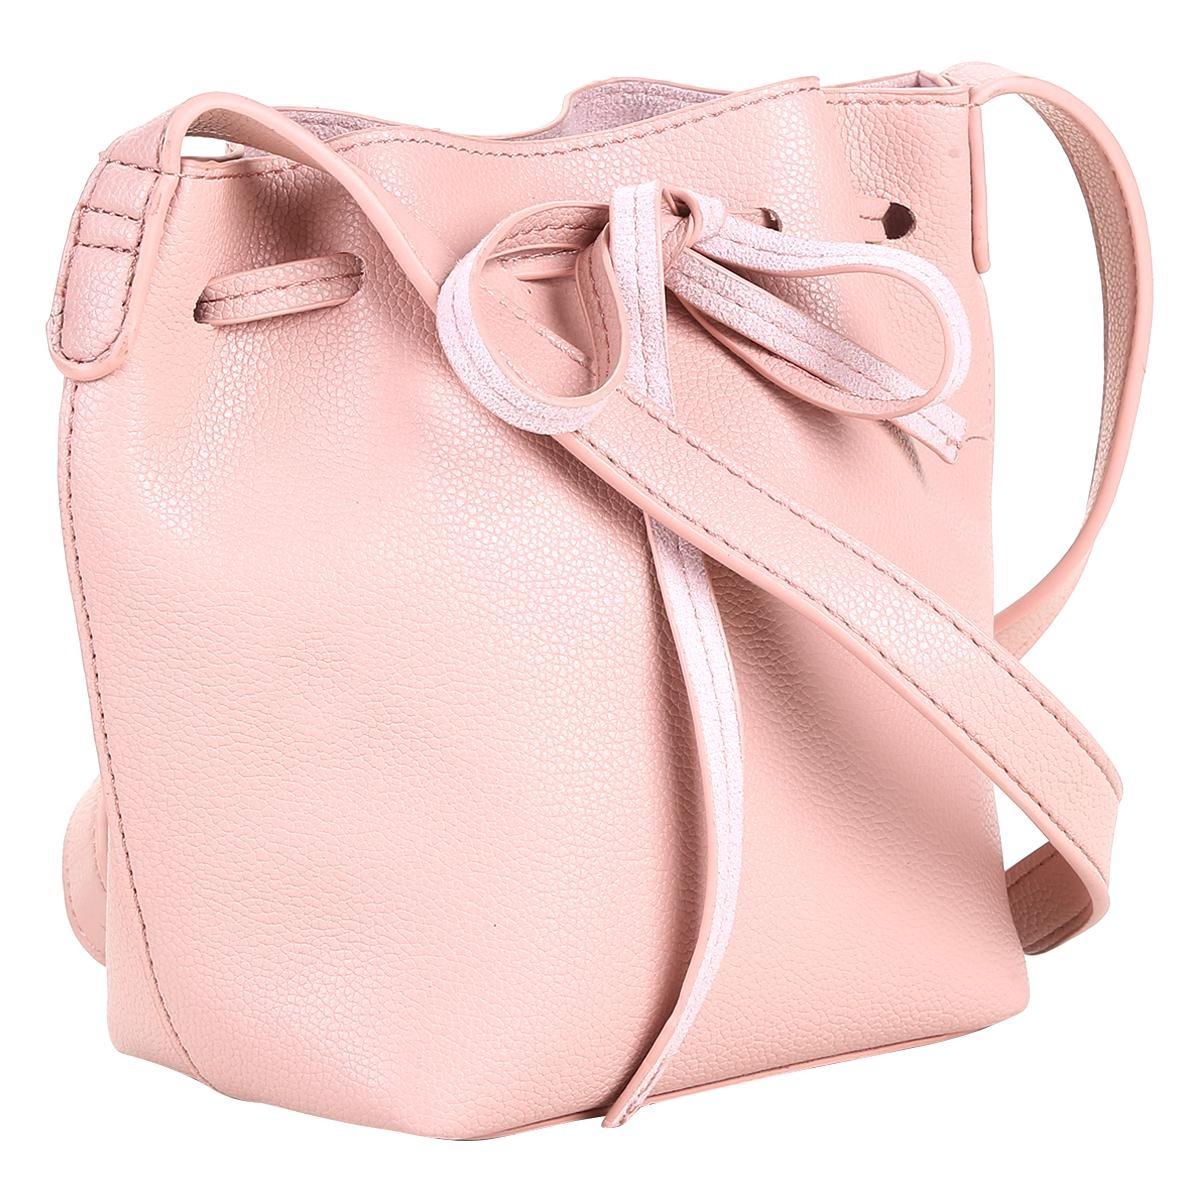 Bolsa Shoestock Mini Bucket Candy Feminina - Tamanho Único - R  69 ... a1180d08dea